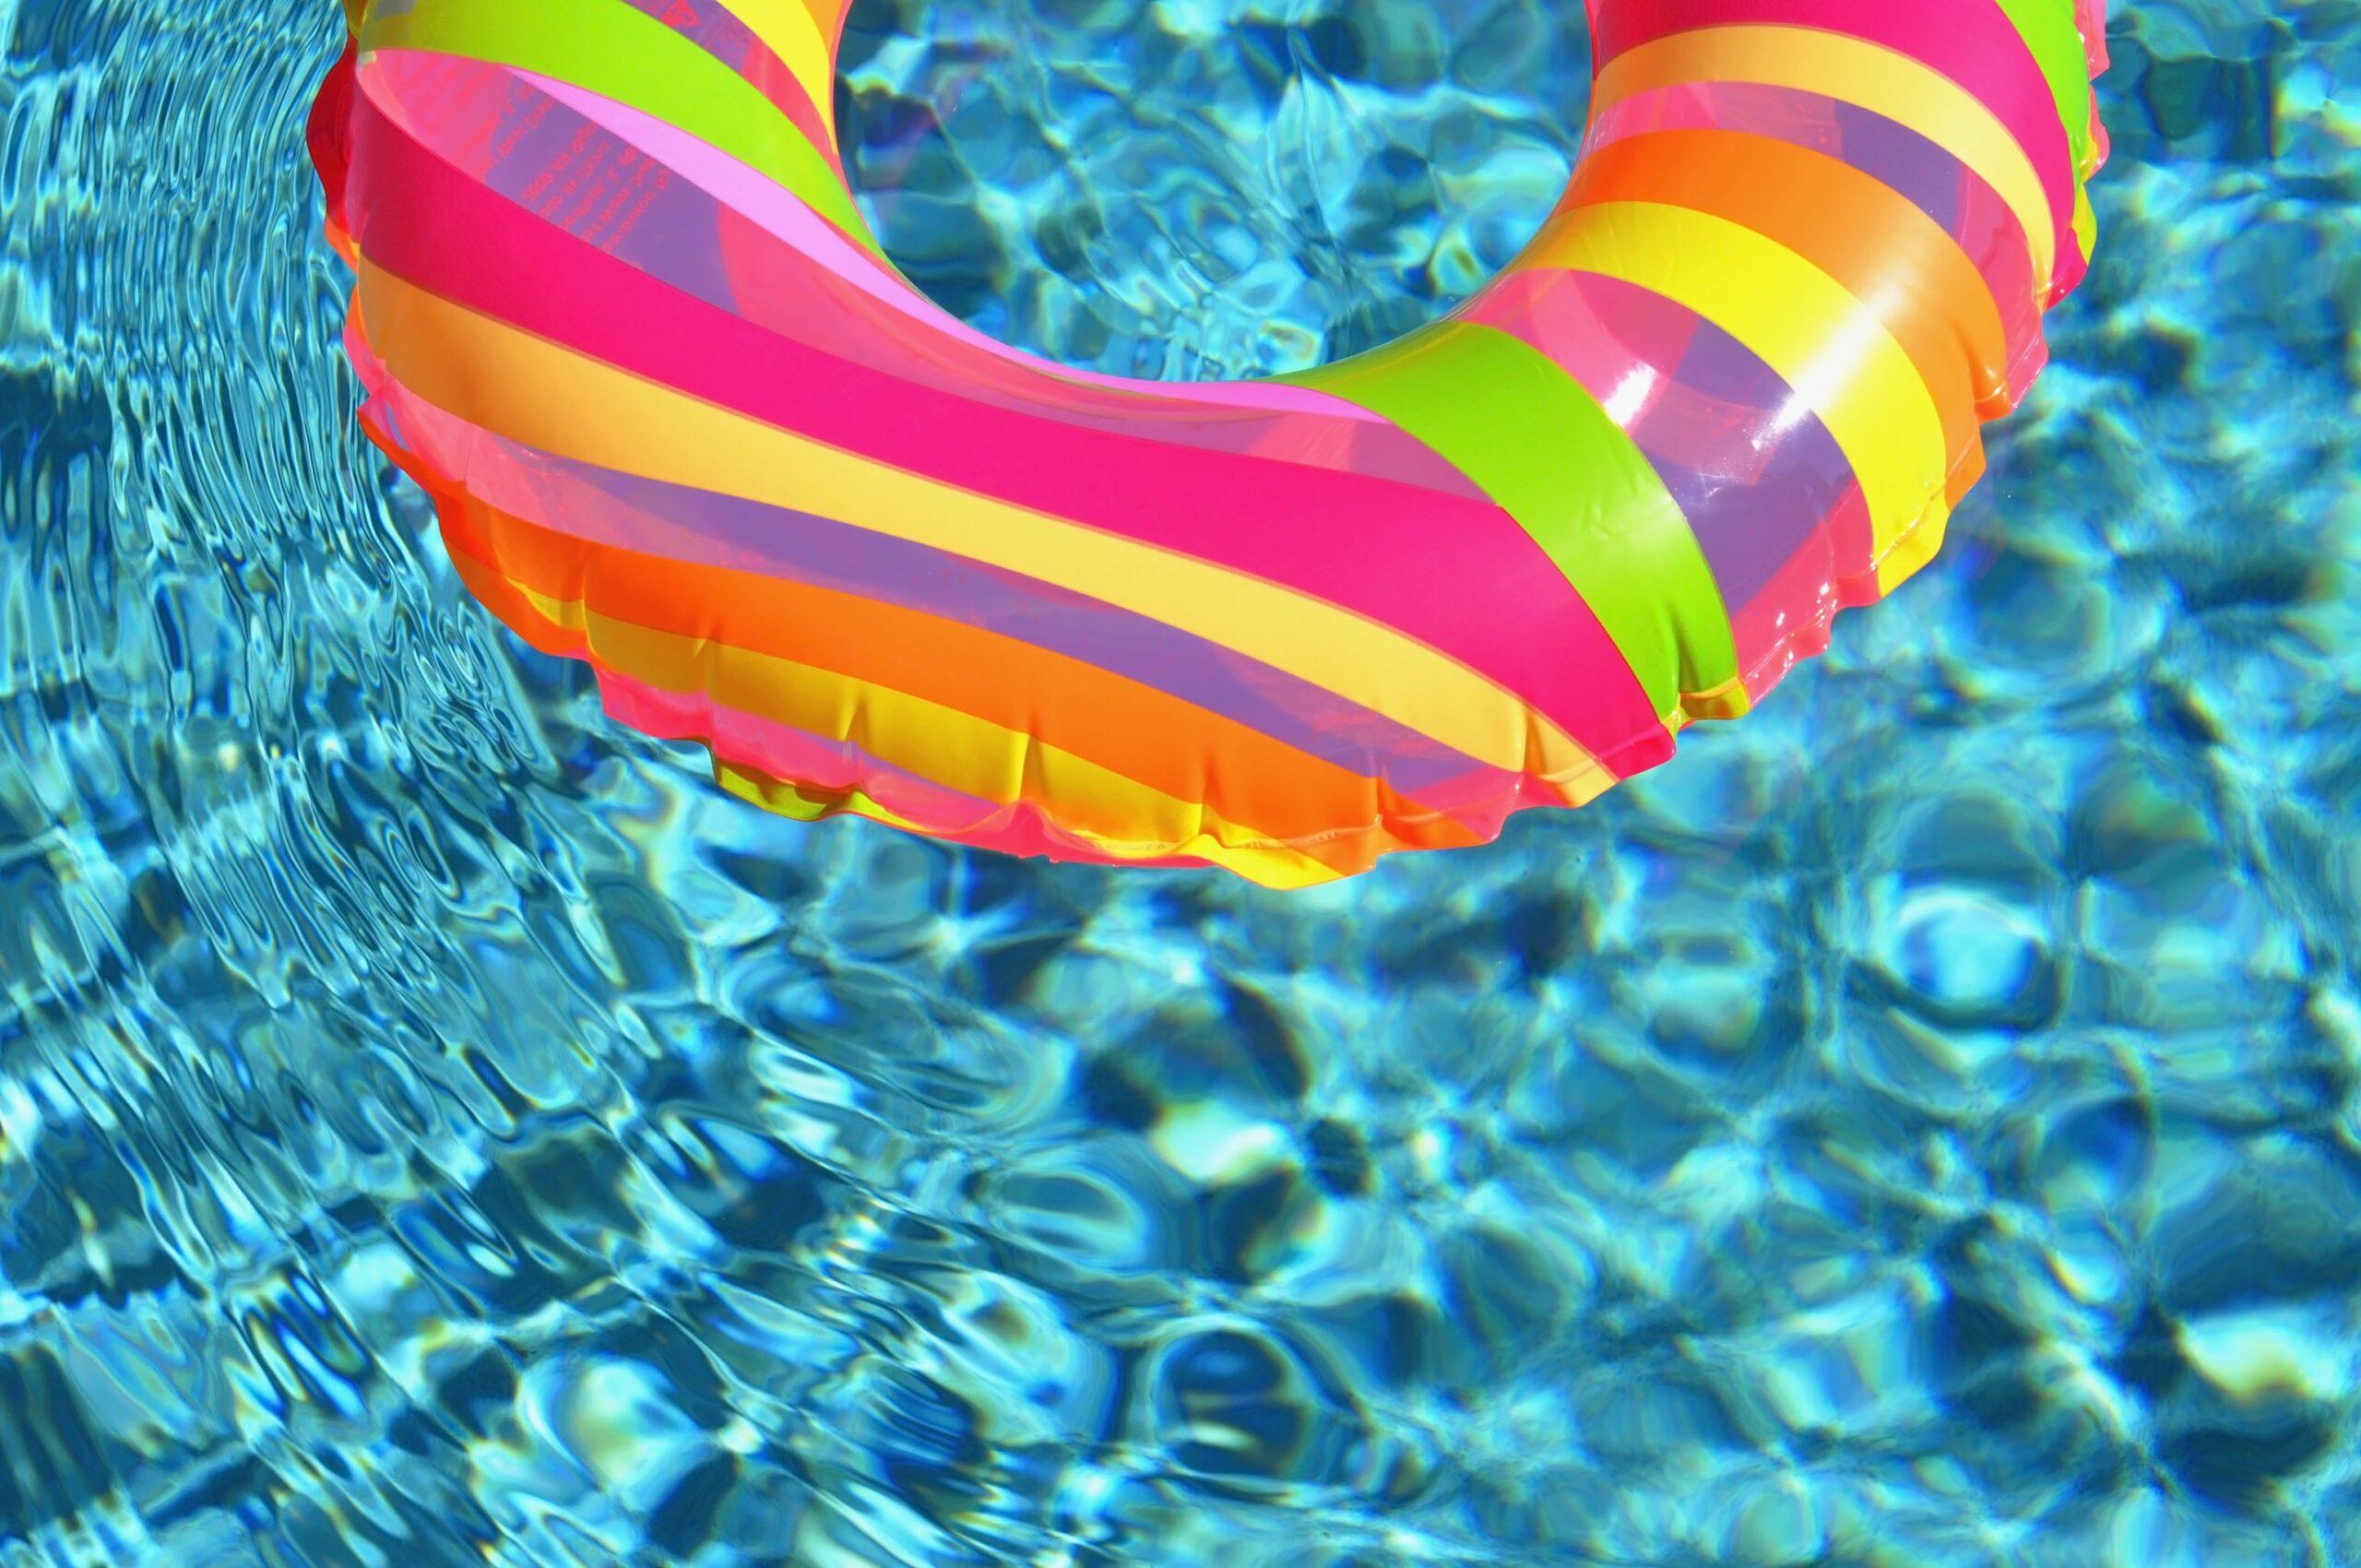 swim_ring_in_the_pool_204904